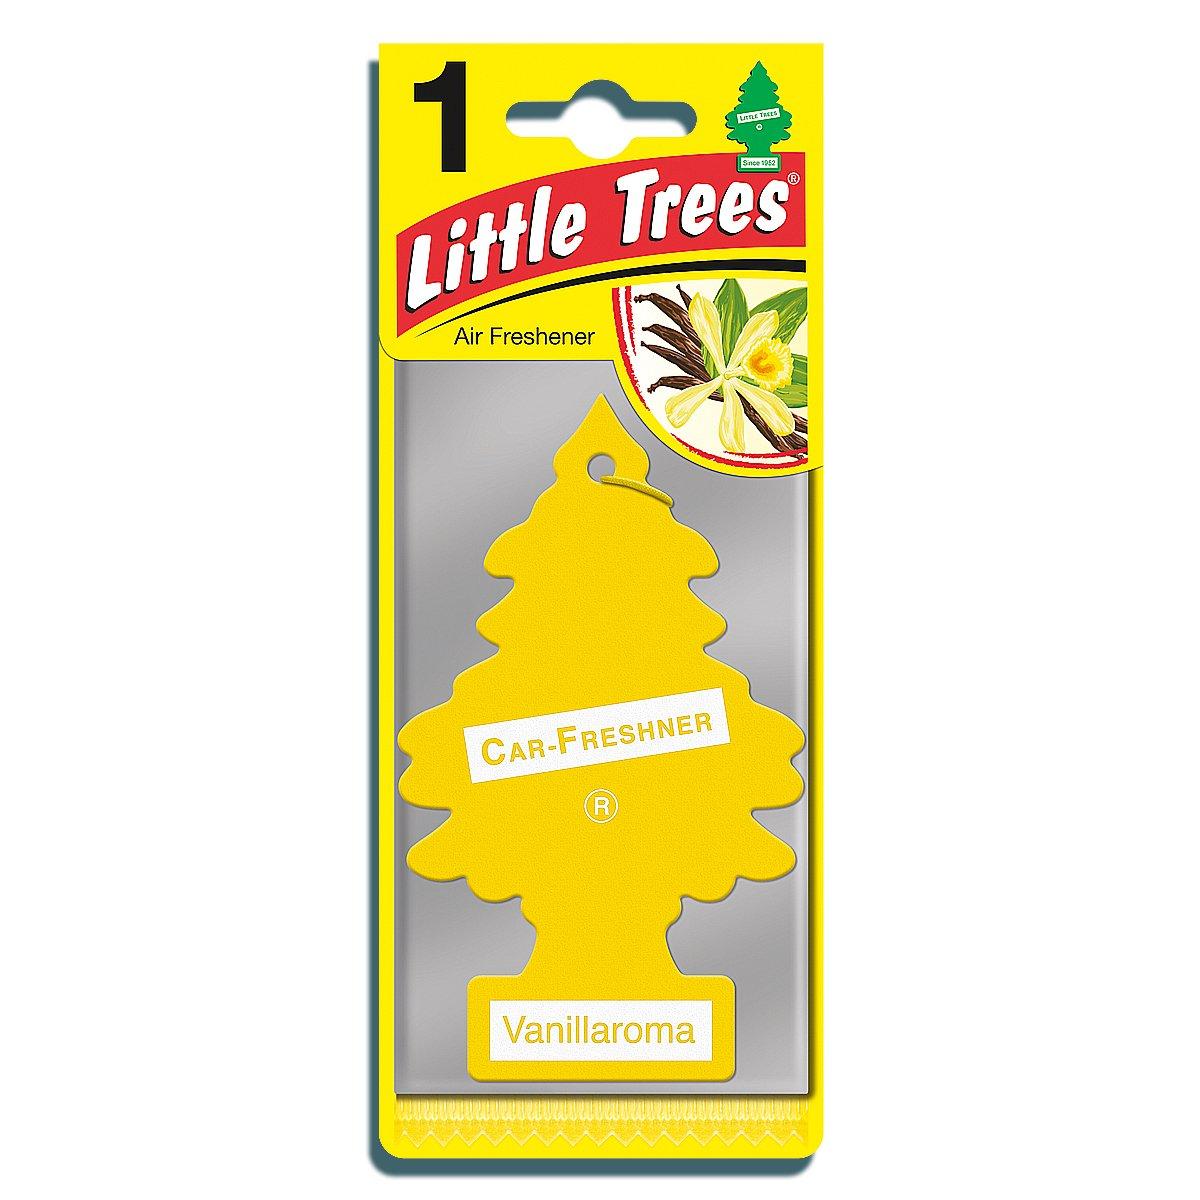 Little trees mtr0001 air freshener vanillaroma fragrance amazon co uk car motorbike